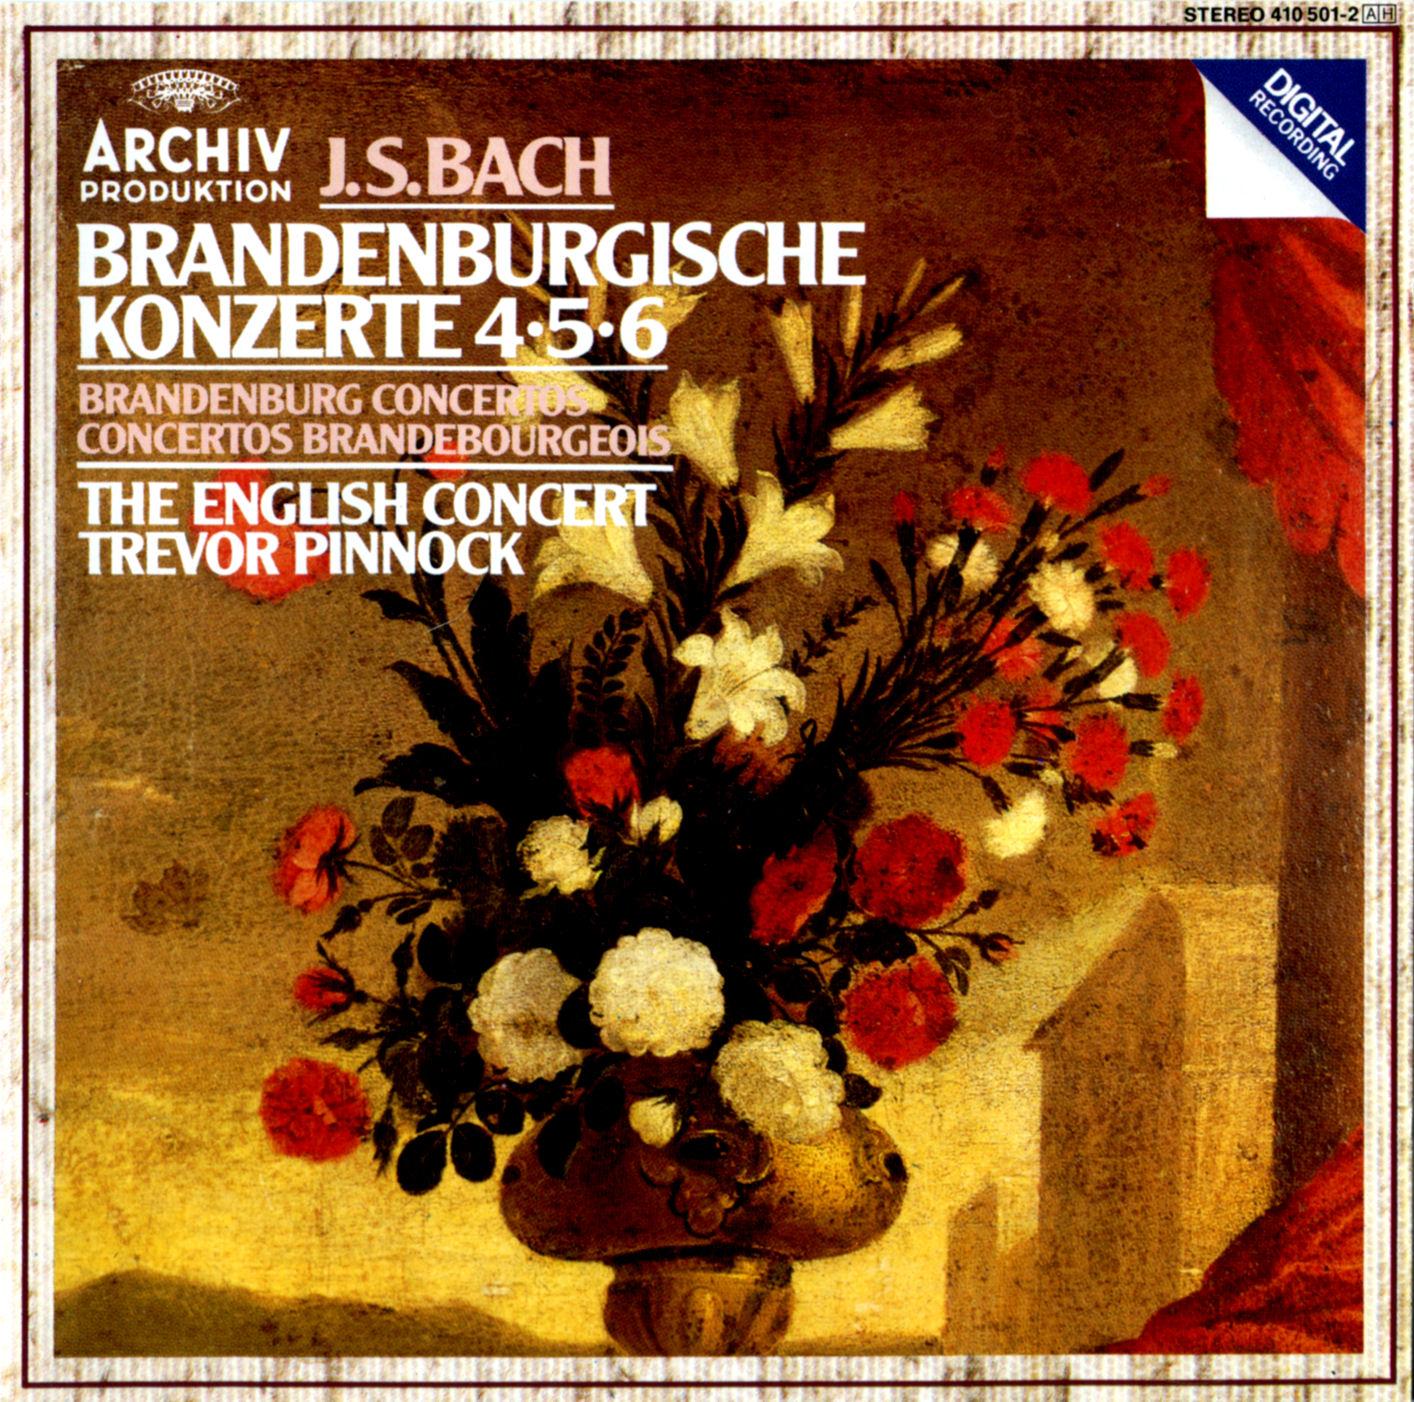 Johann Sebastian Bach* J. S. Bach - The Organ Works, Volume 5